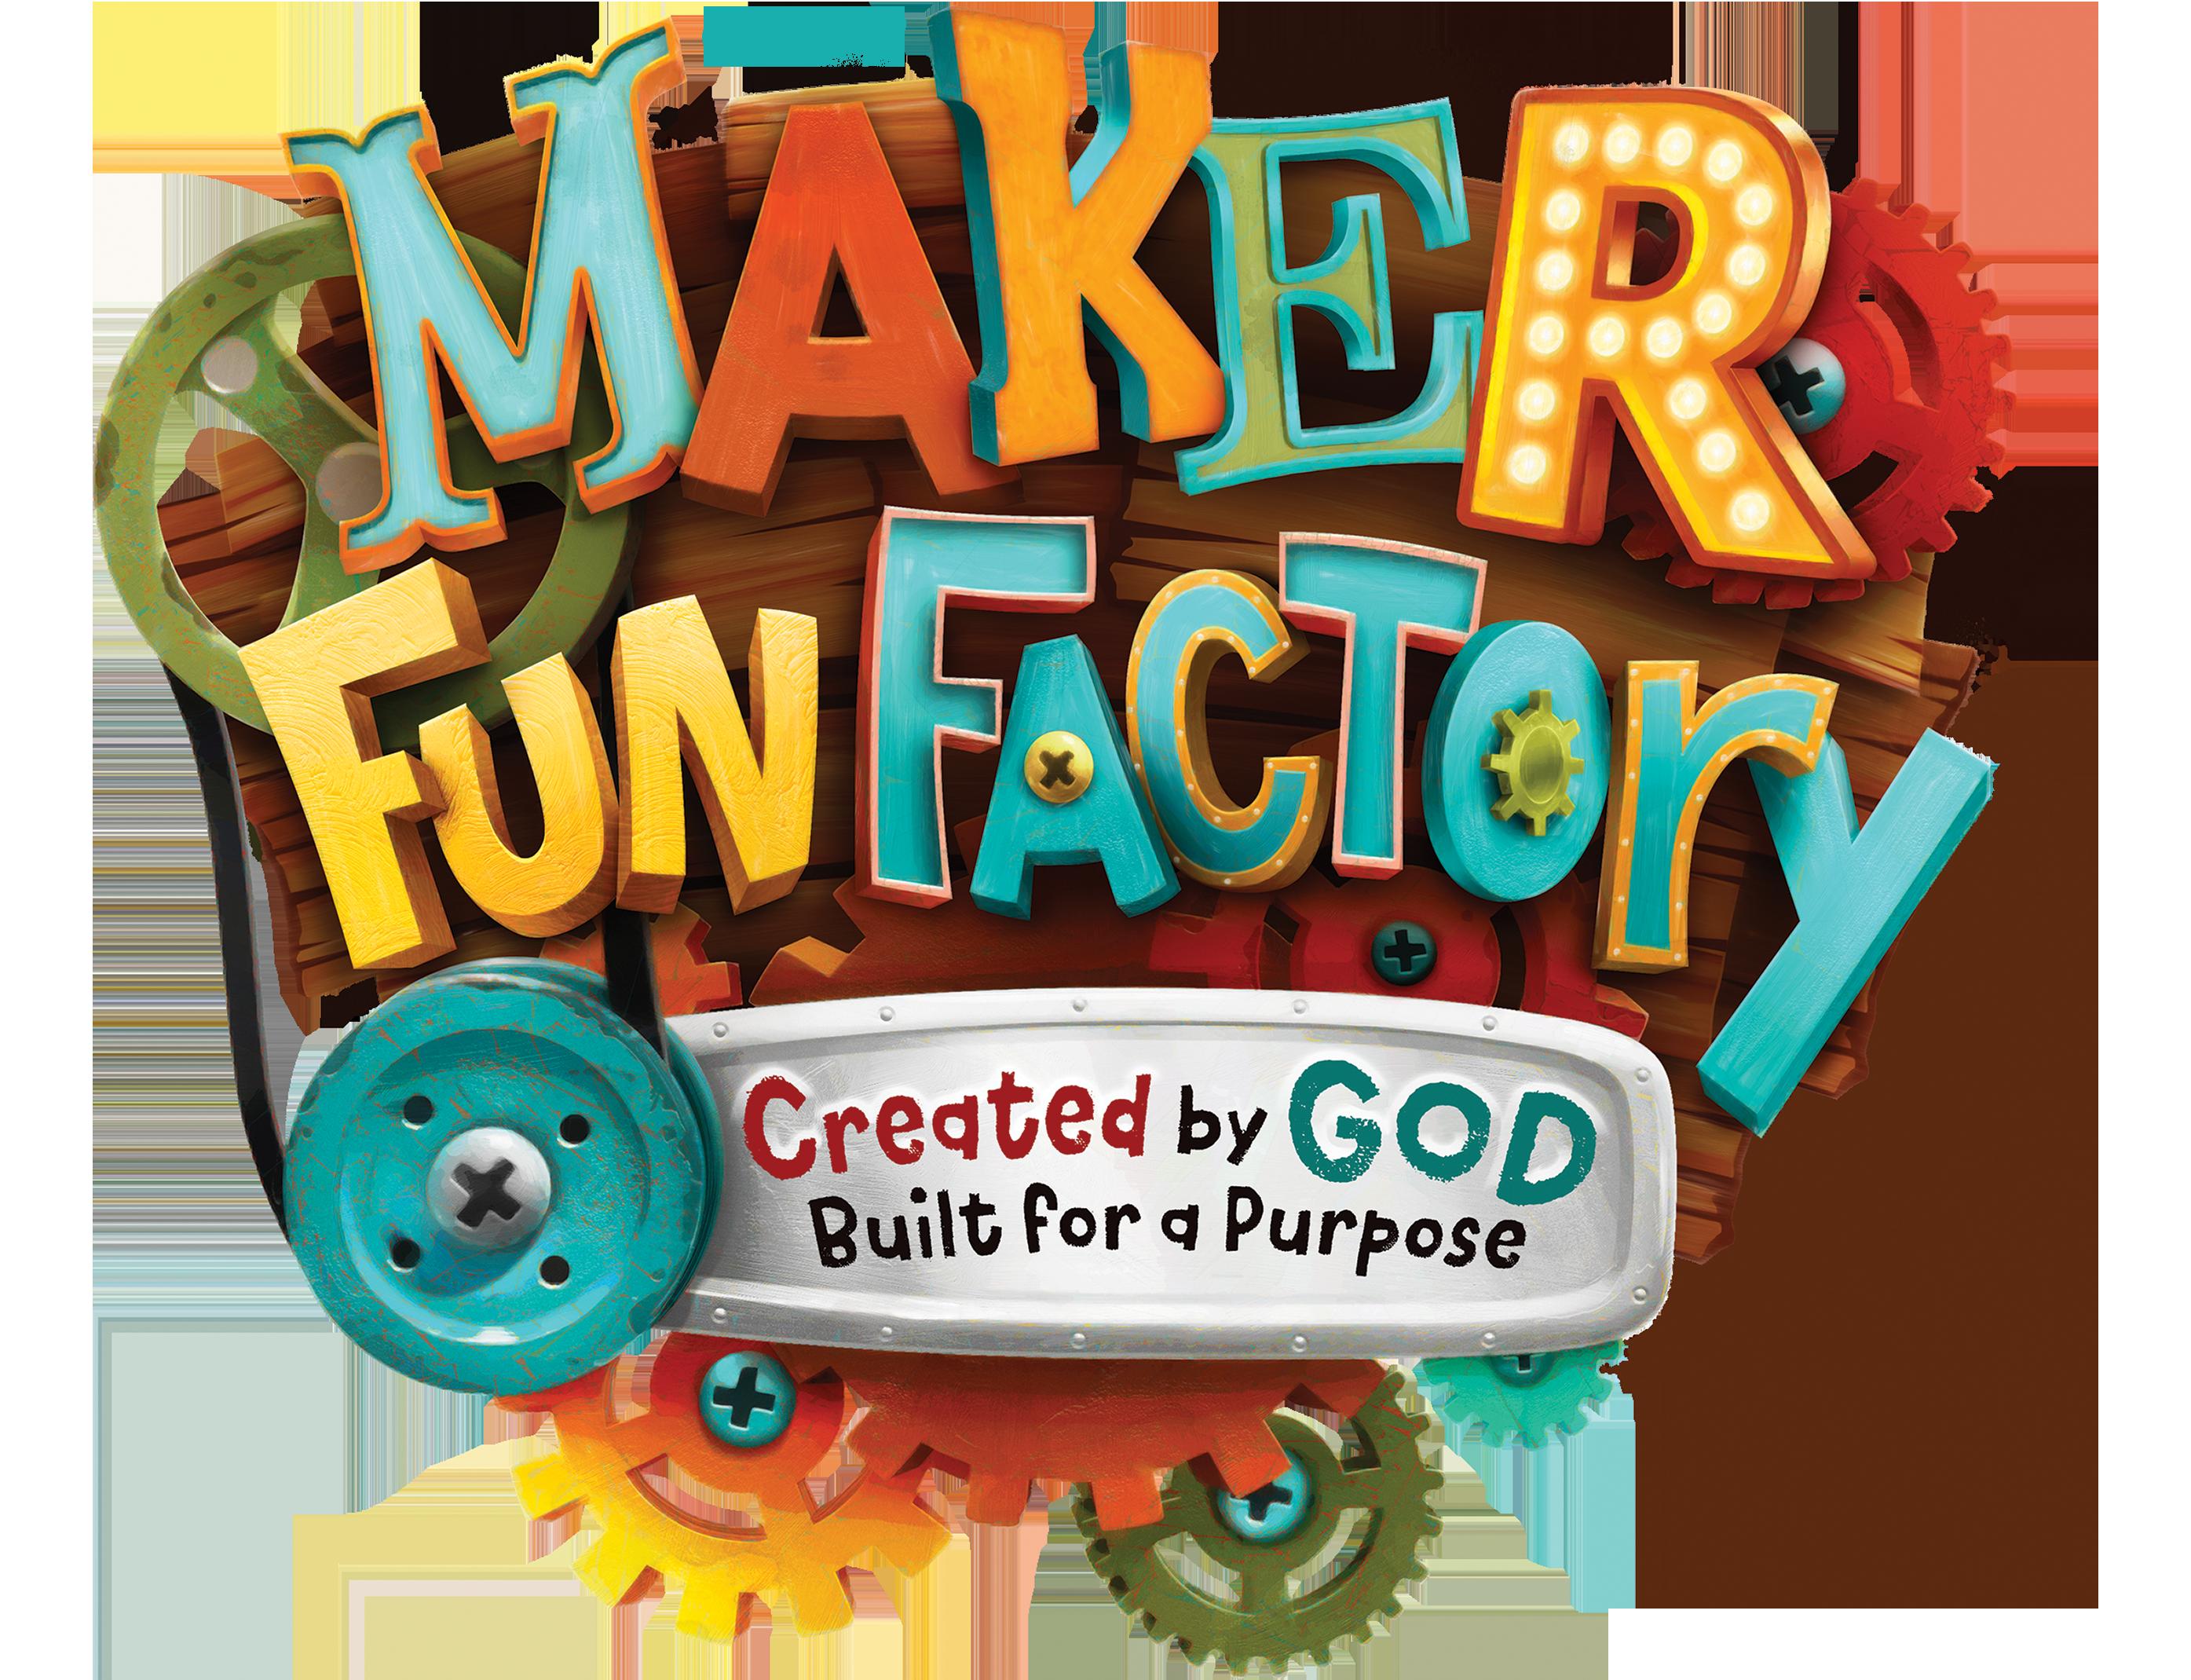 Factory clipart factory machine. Harvest bible chapel granger